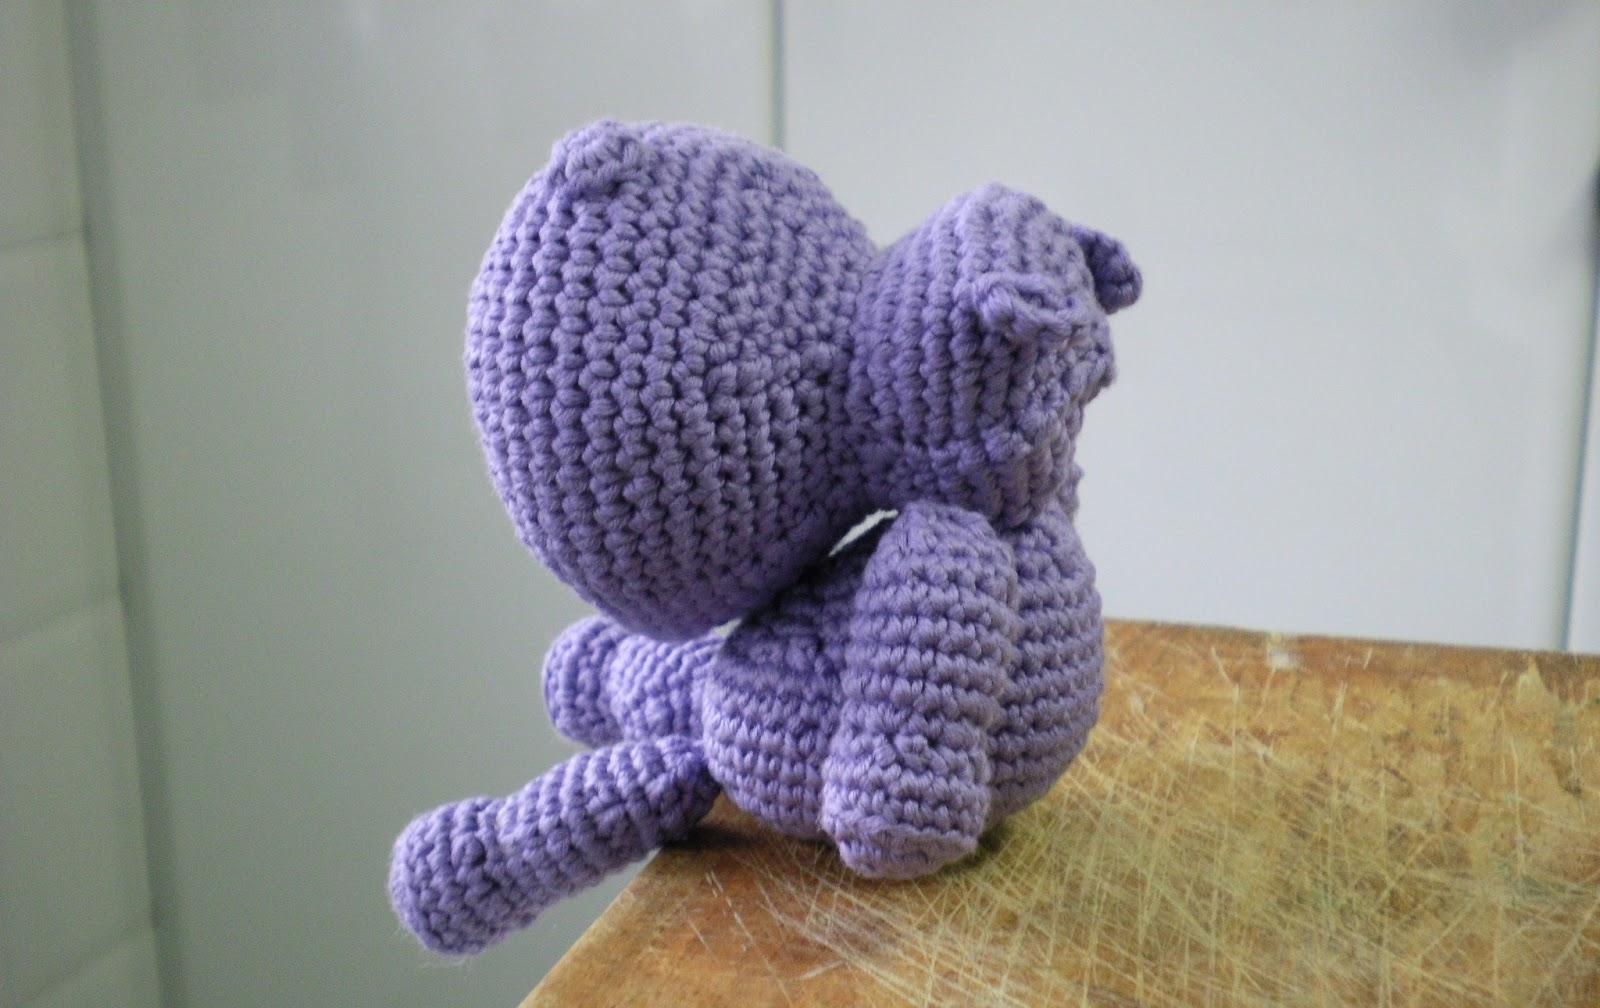 maia_knit: Hipopótamo